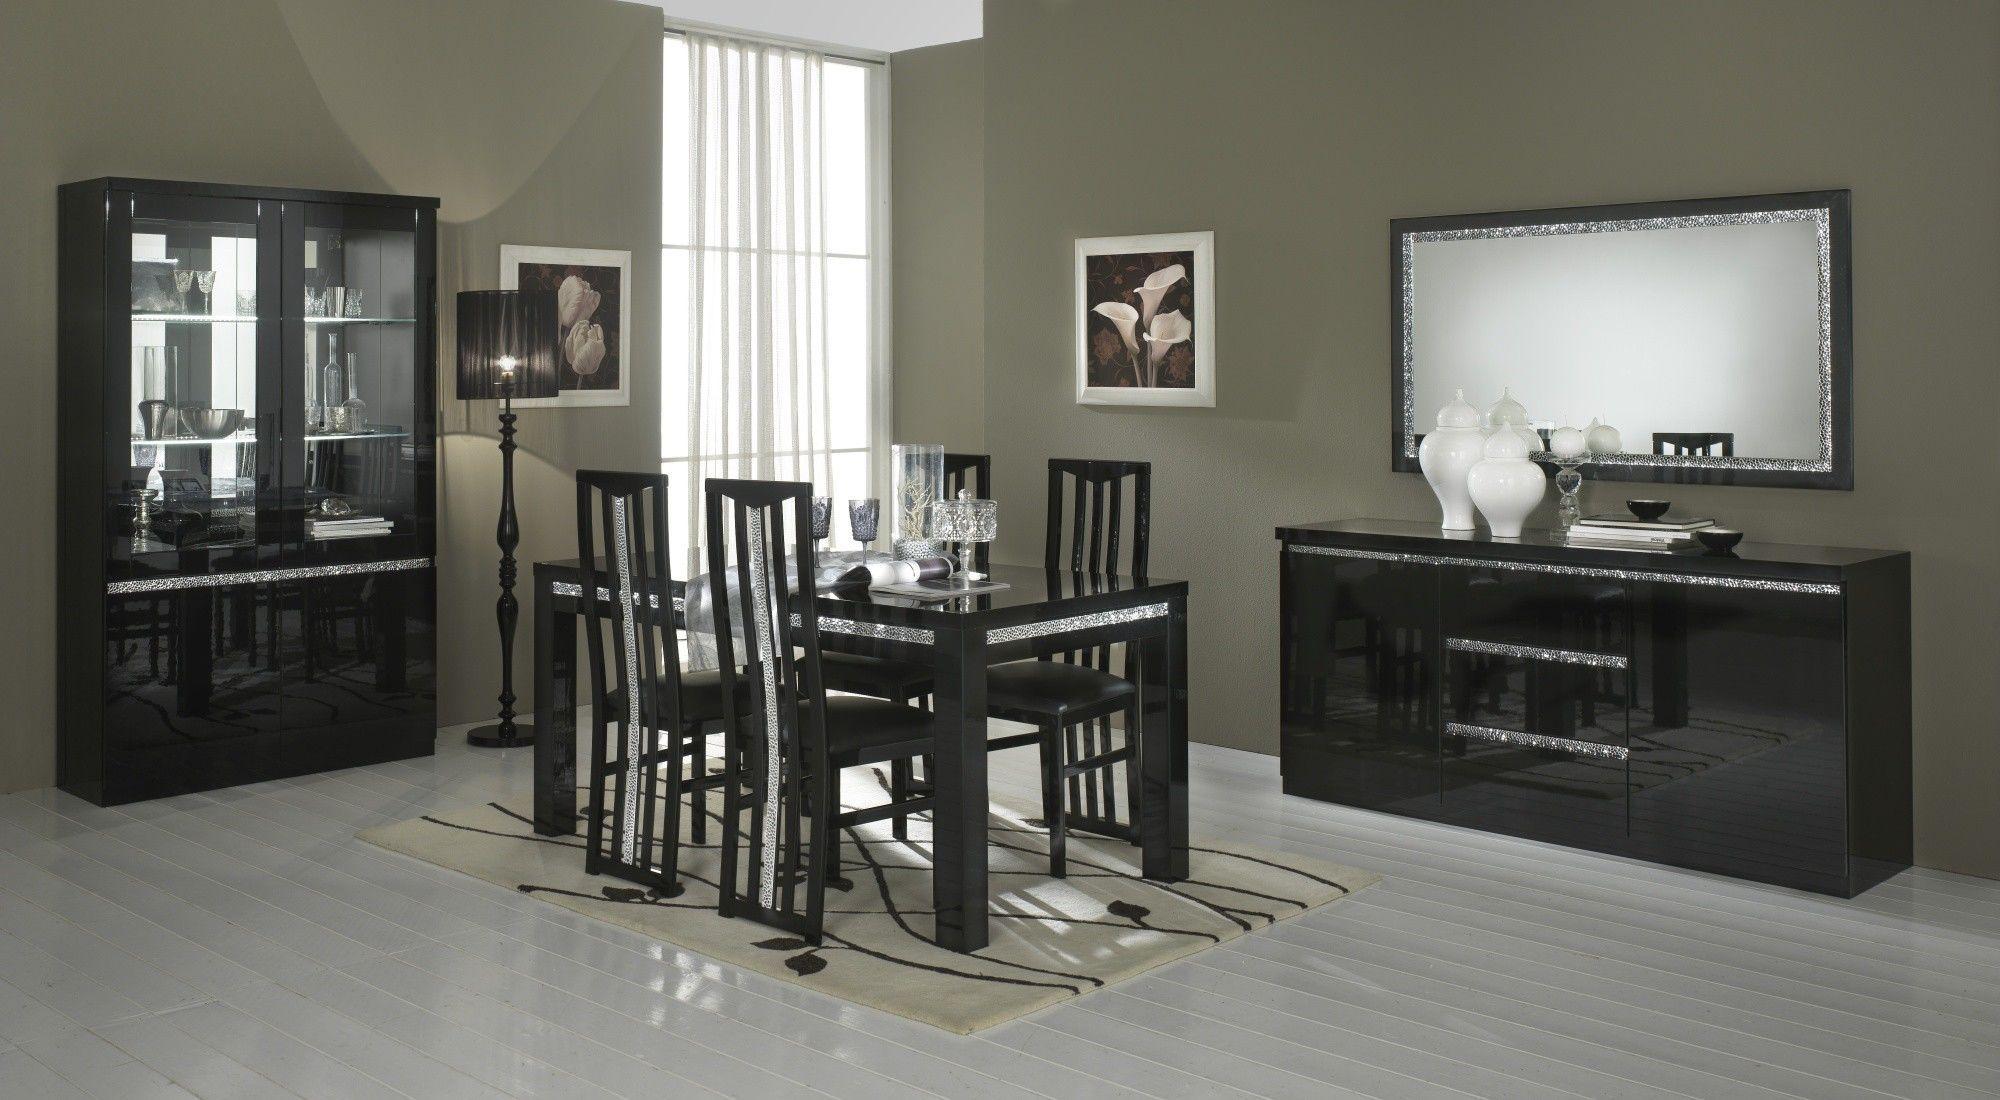 Conforama chaise salle manger en bois furniture home - Conforama catalogue salle a manger ...